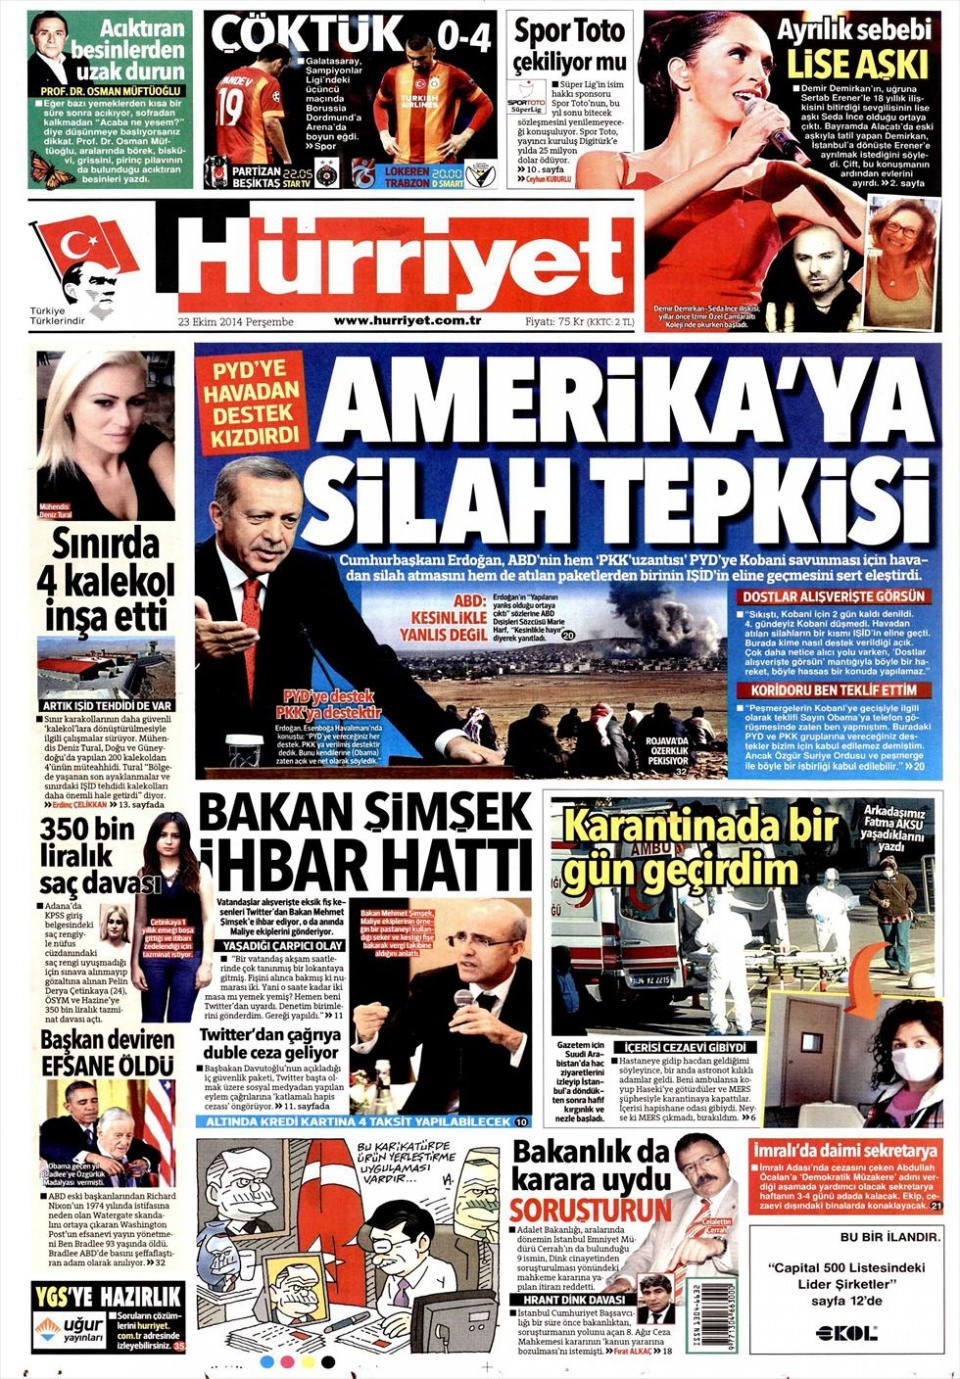 23 Ekim 2014 gazete manşetleri 10